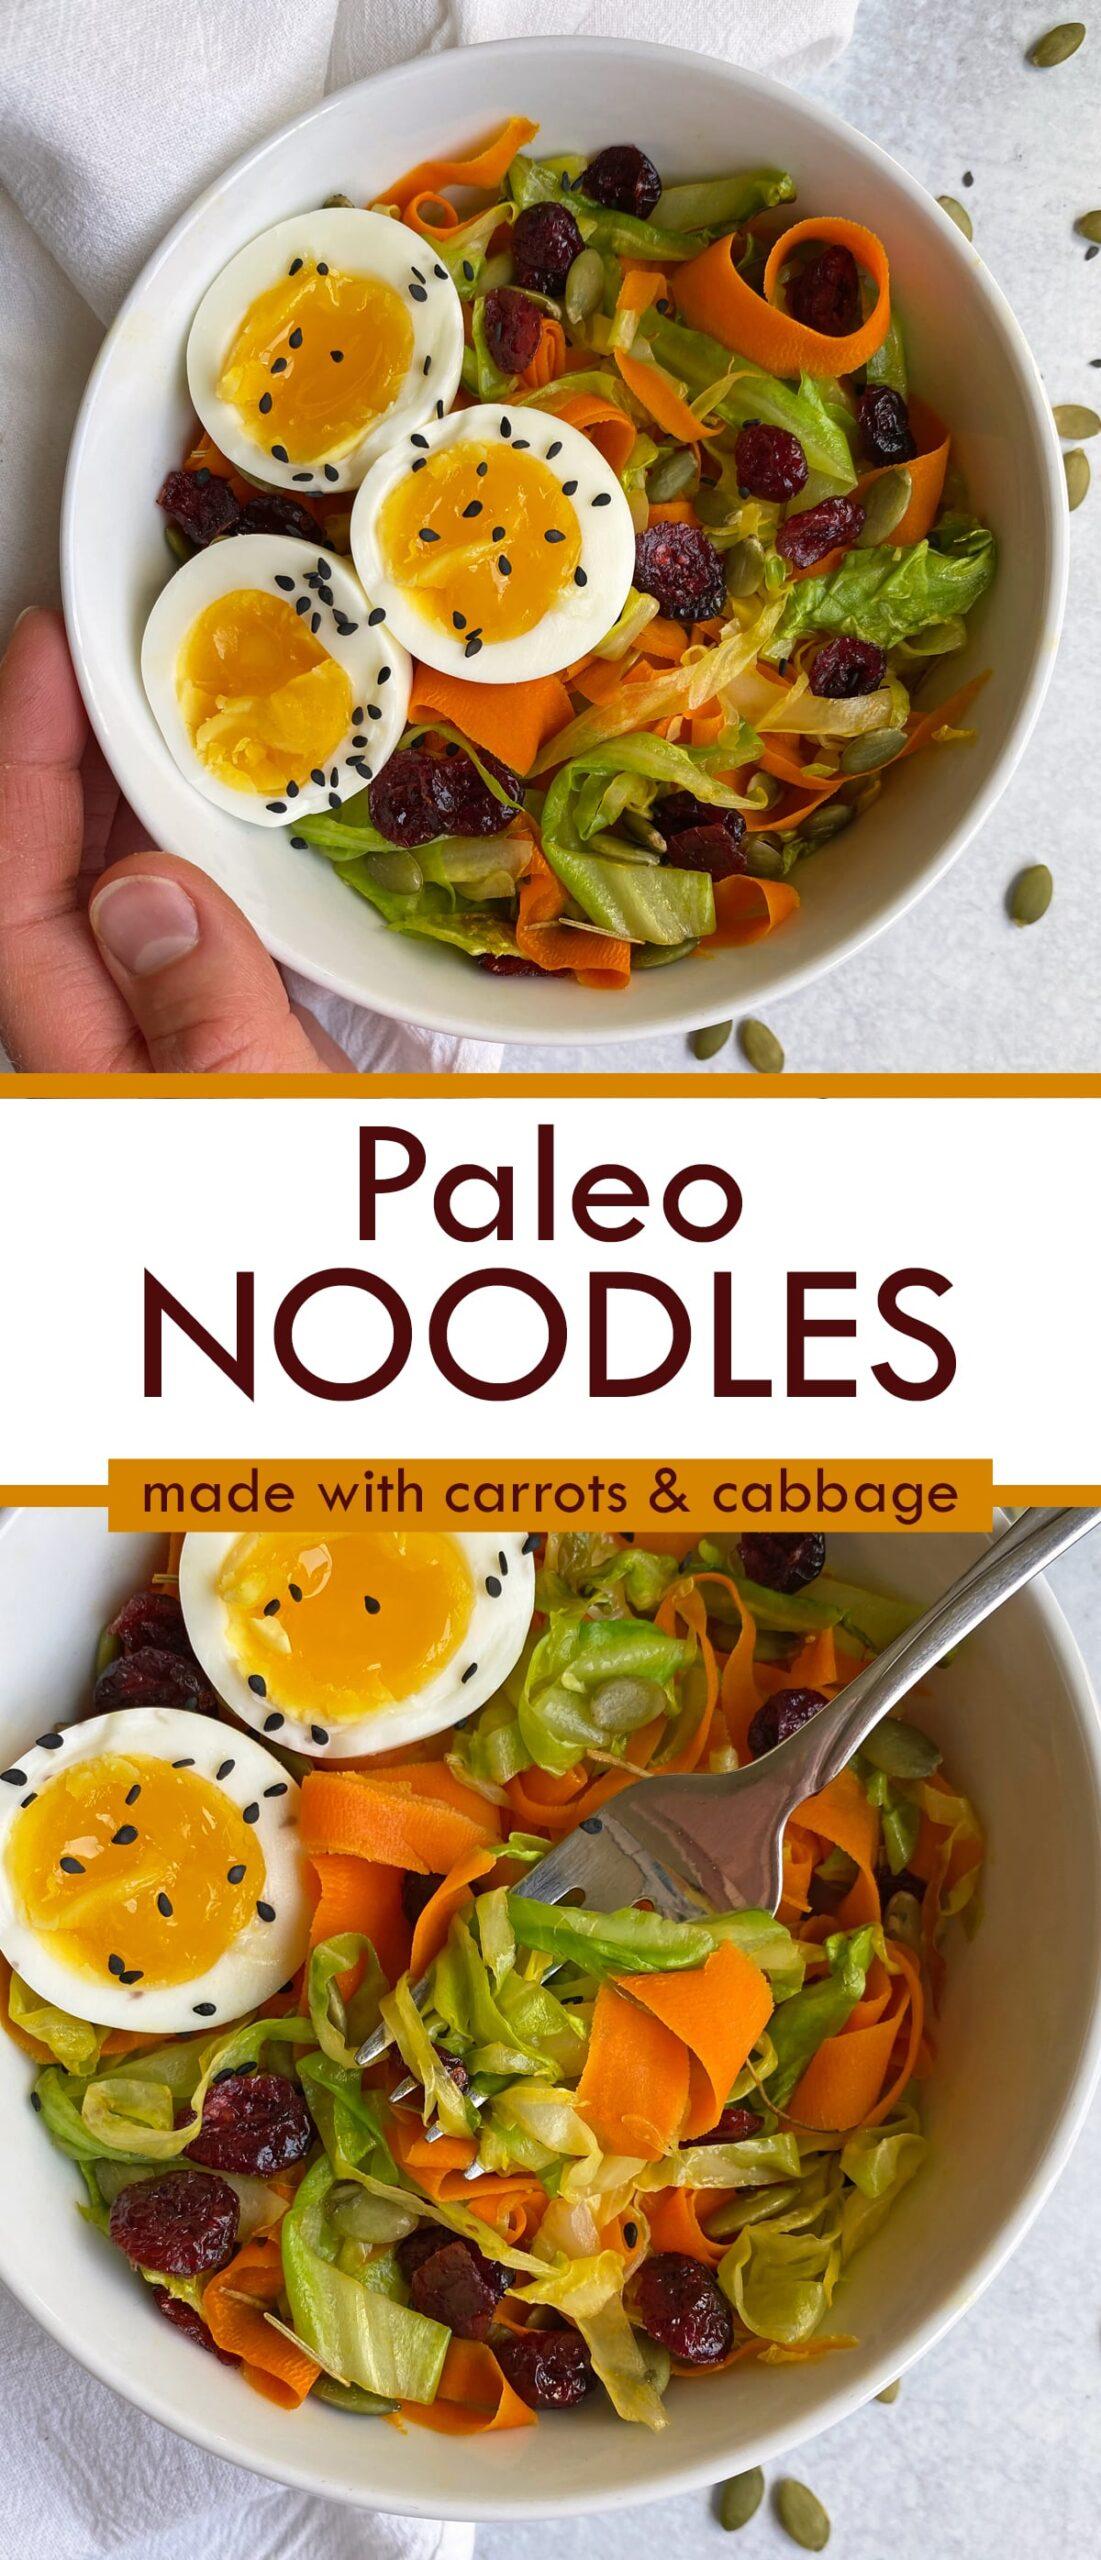 paleo-noodles-recipe-pinterest-image